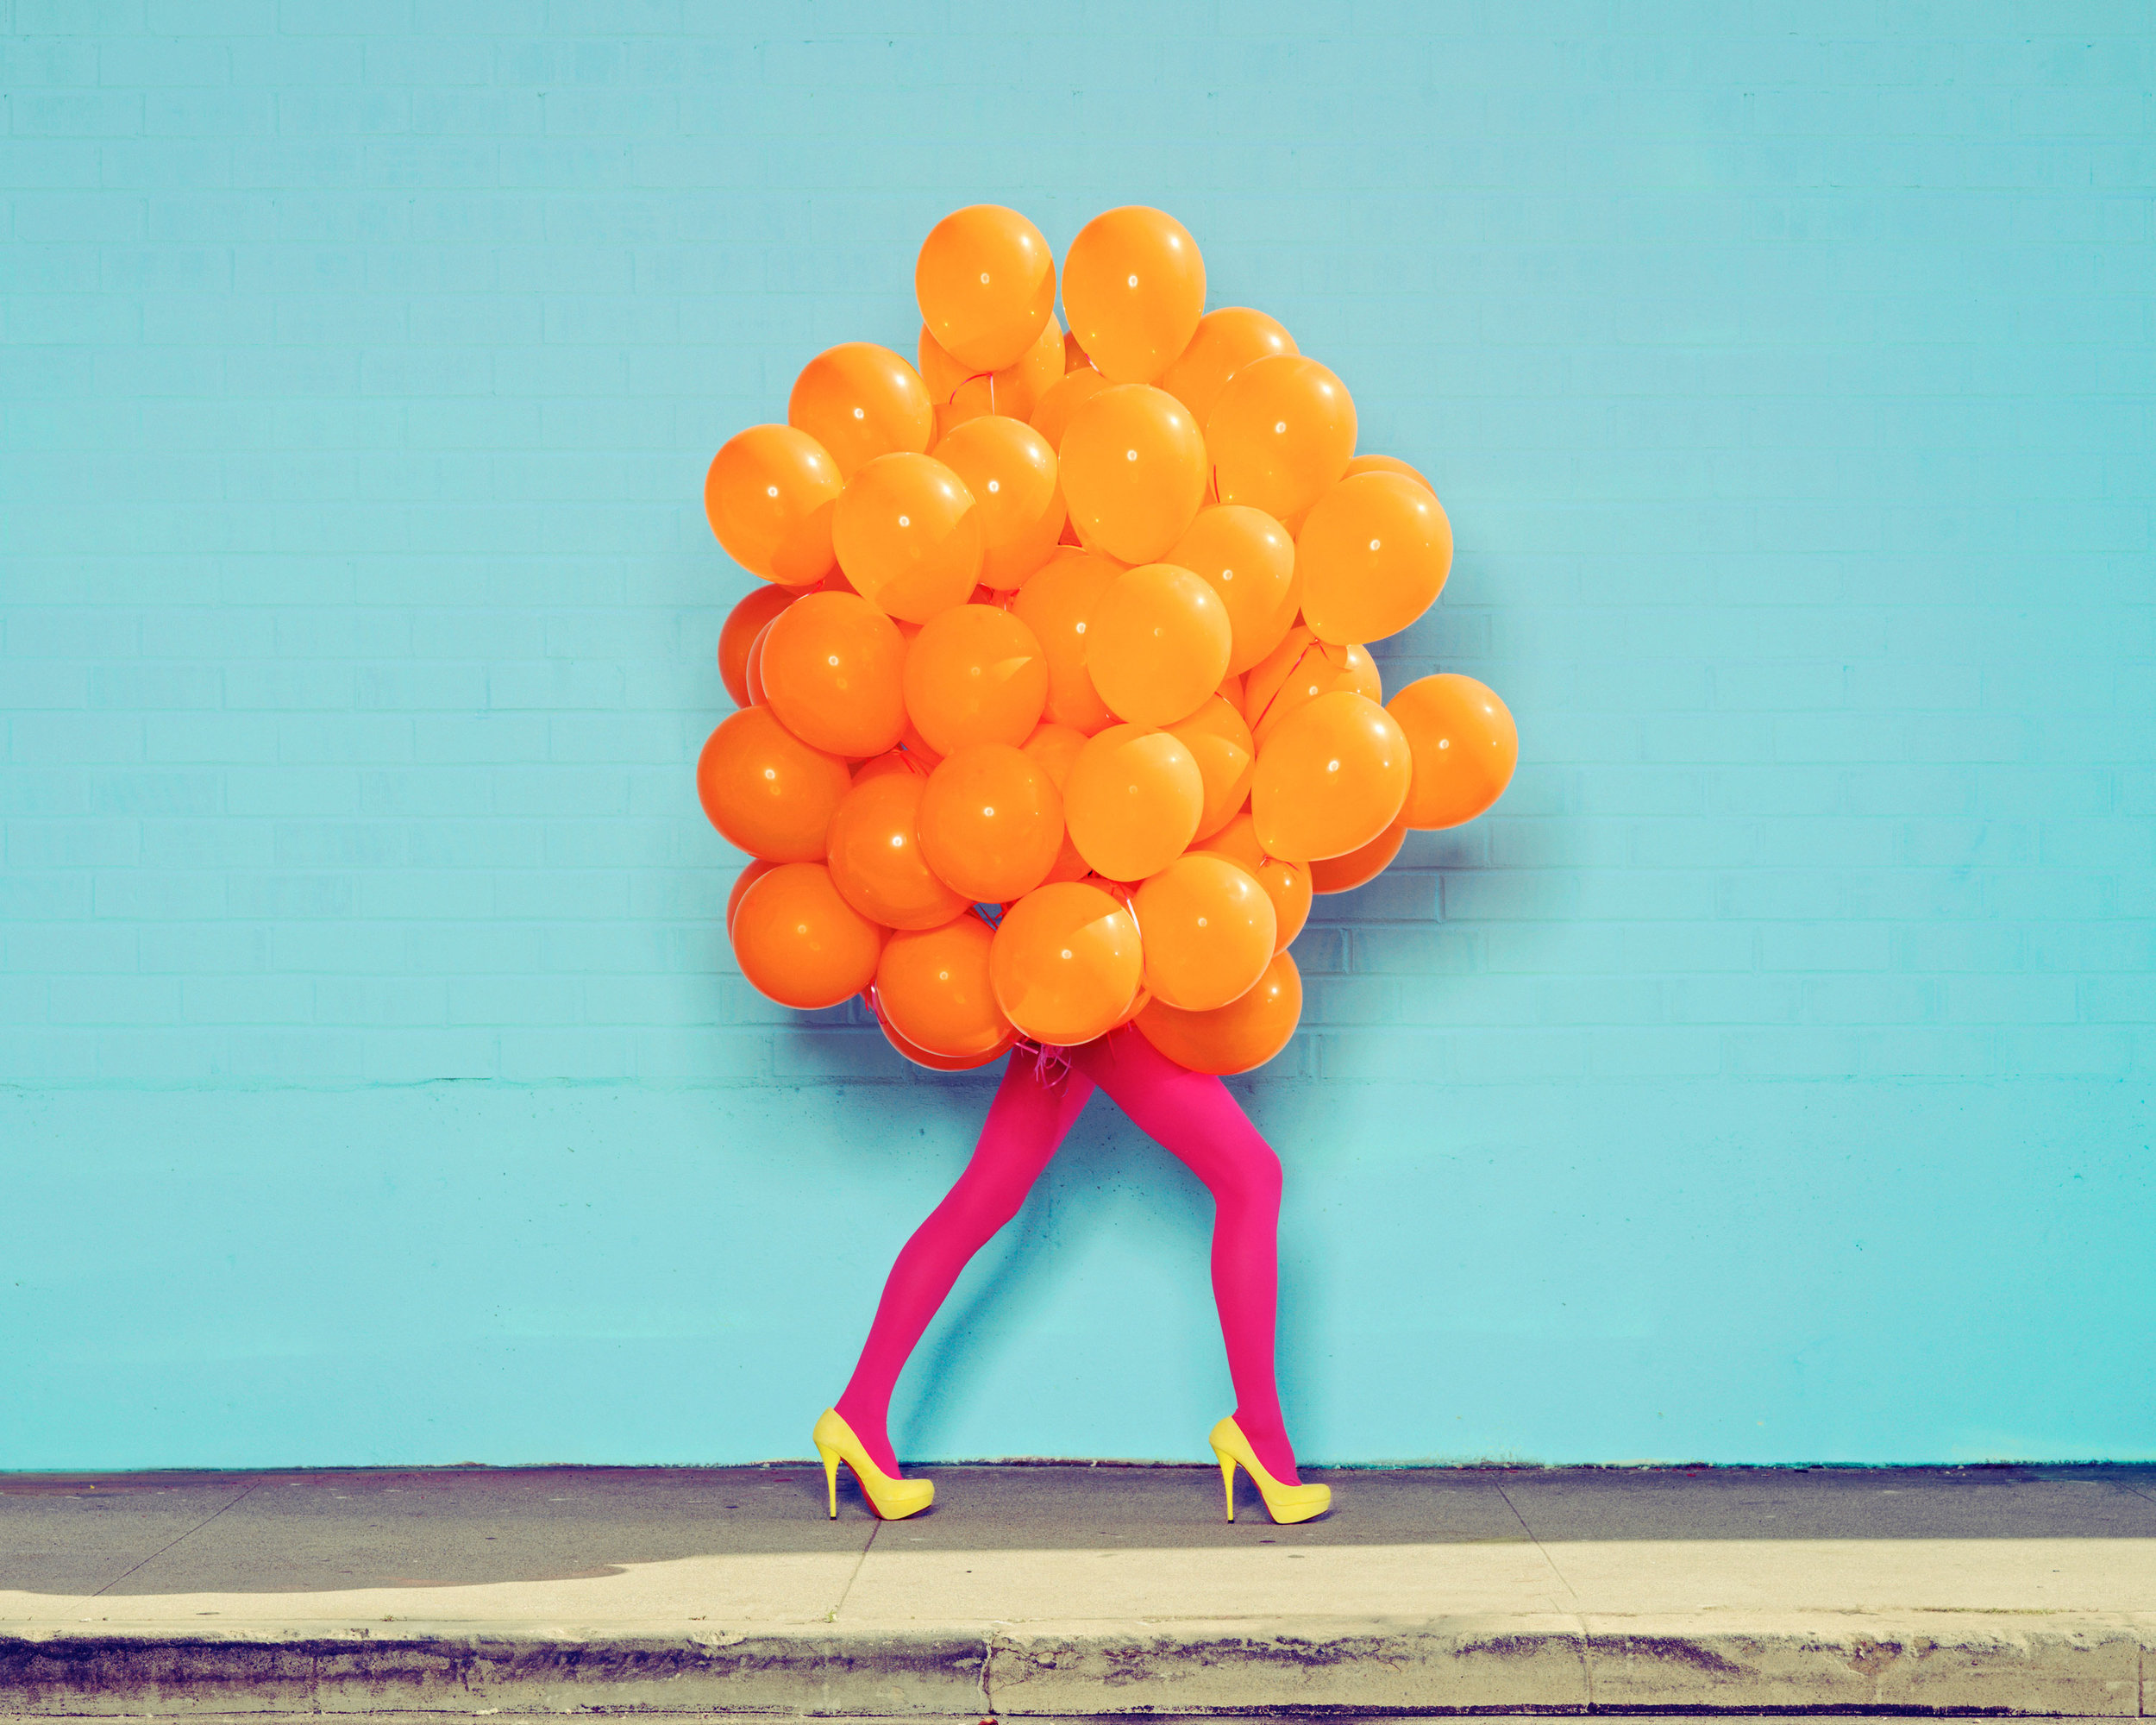 Ramona Rosales,  Je Ne Suis Pas Seul Sans Toi (Orange Balloons) , 2013  Digital pigment print, 30 x 40 in, edition of 5; 20 x 24 in, edition of 5; 8 x 10 in, edition of 250   Inquire